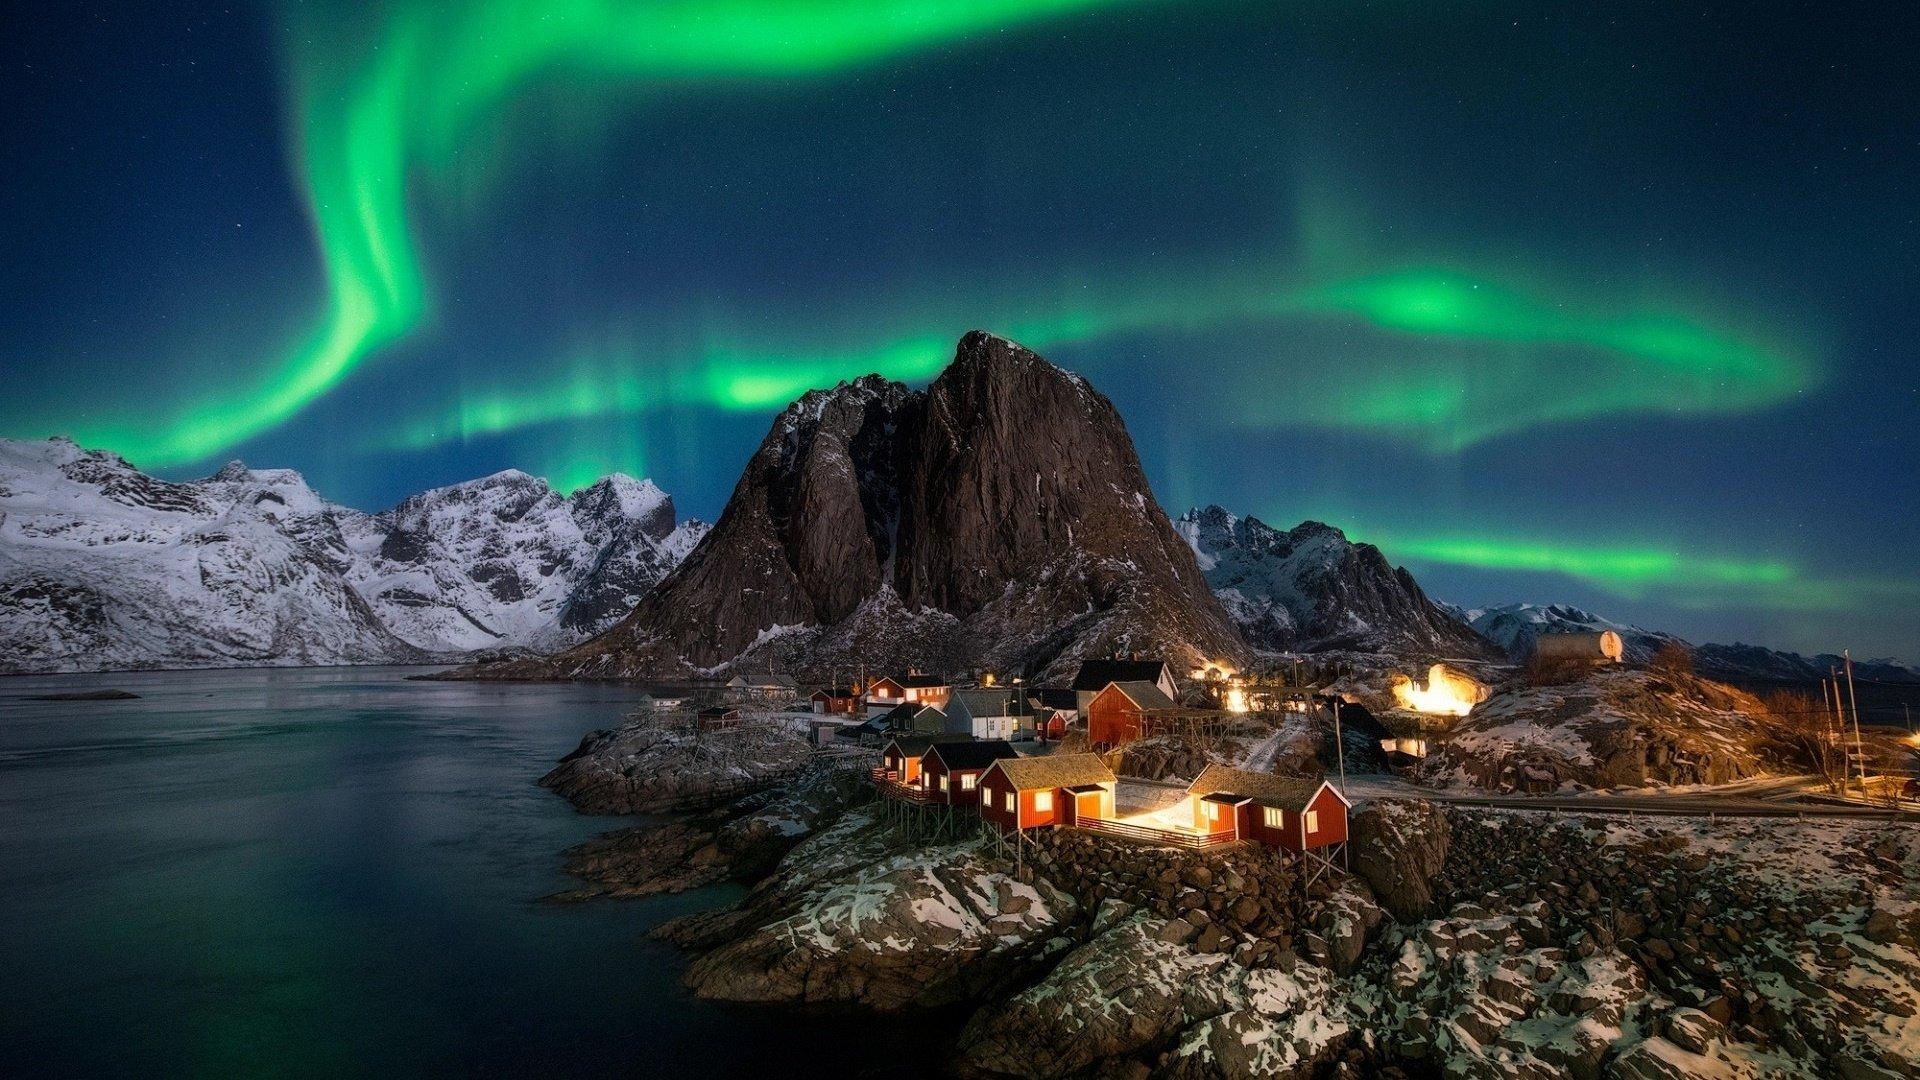 Polar Lights Over Lofoten Norway Hd Wallpaper Background Image 1920x1080 Id 997627 Wallpaper Abyss